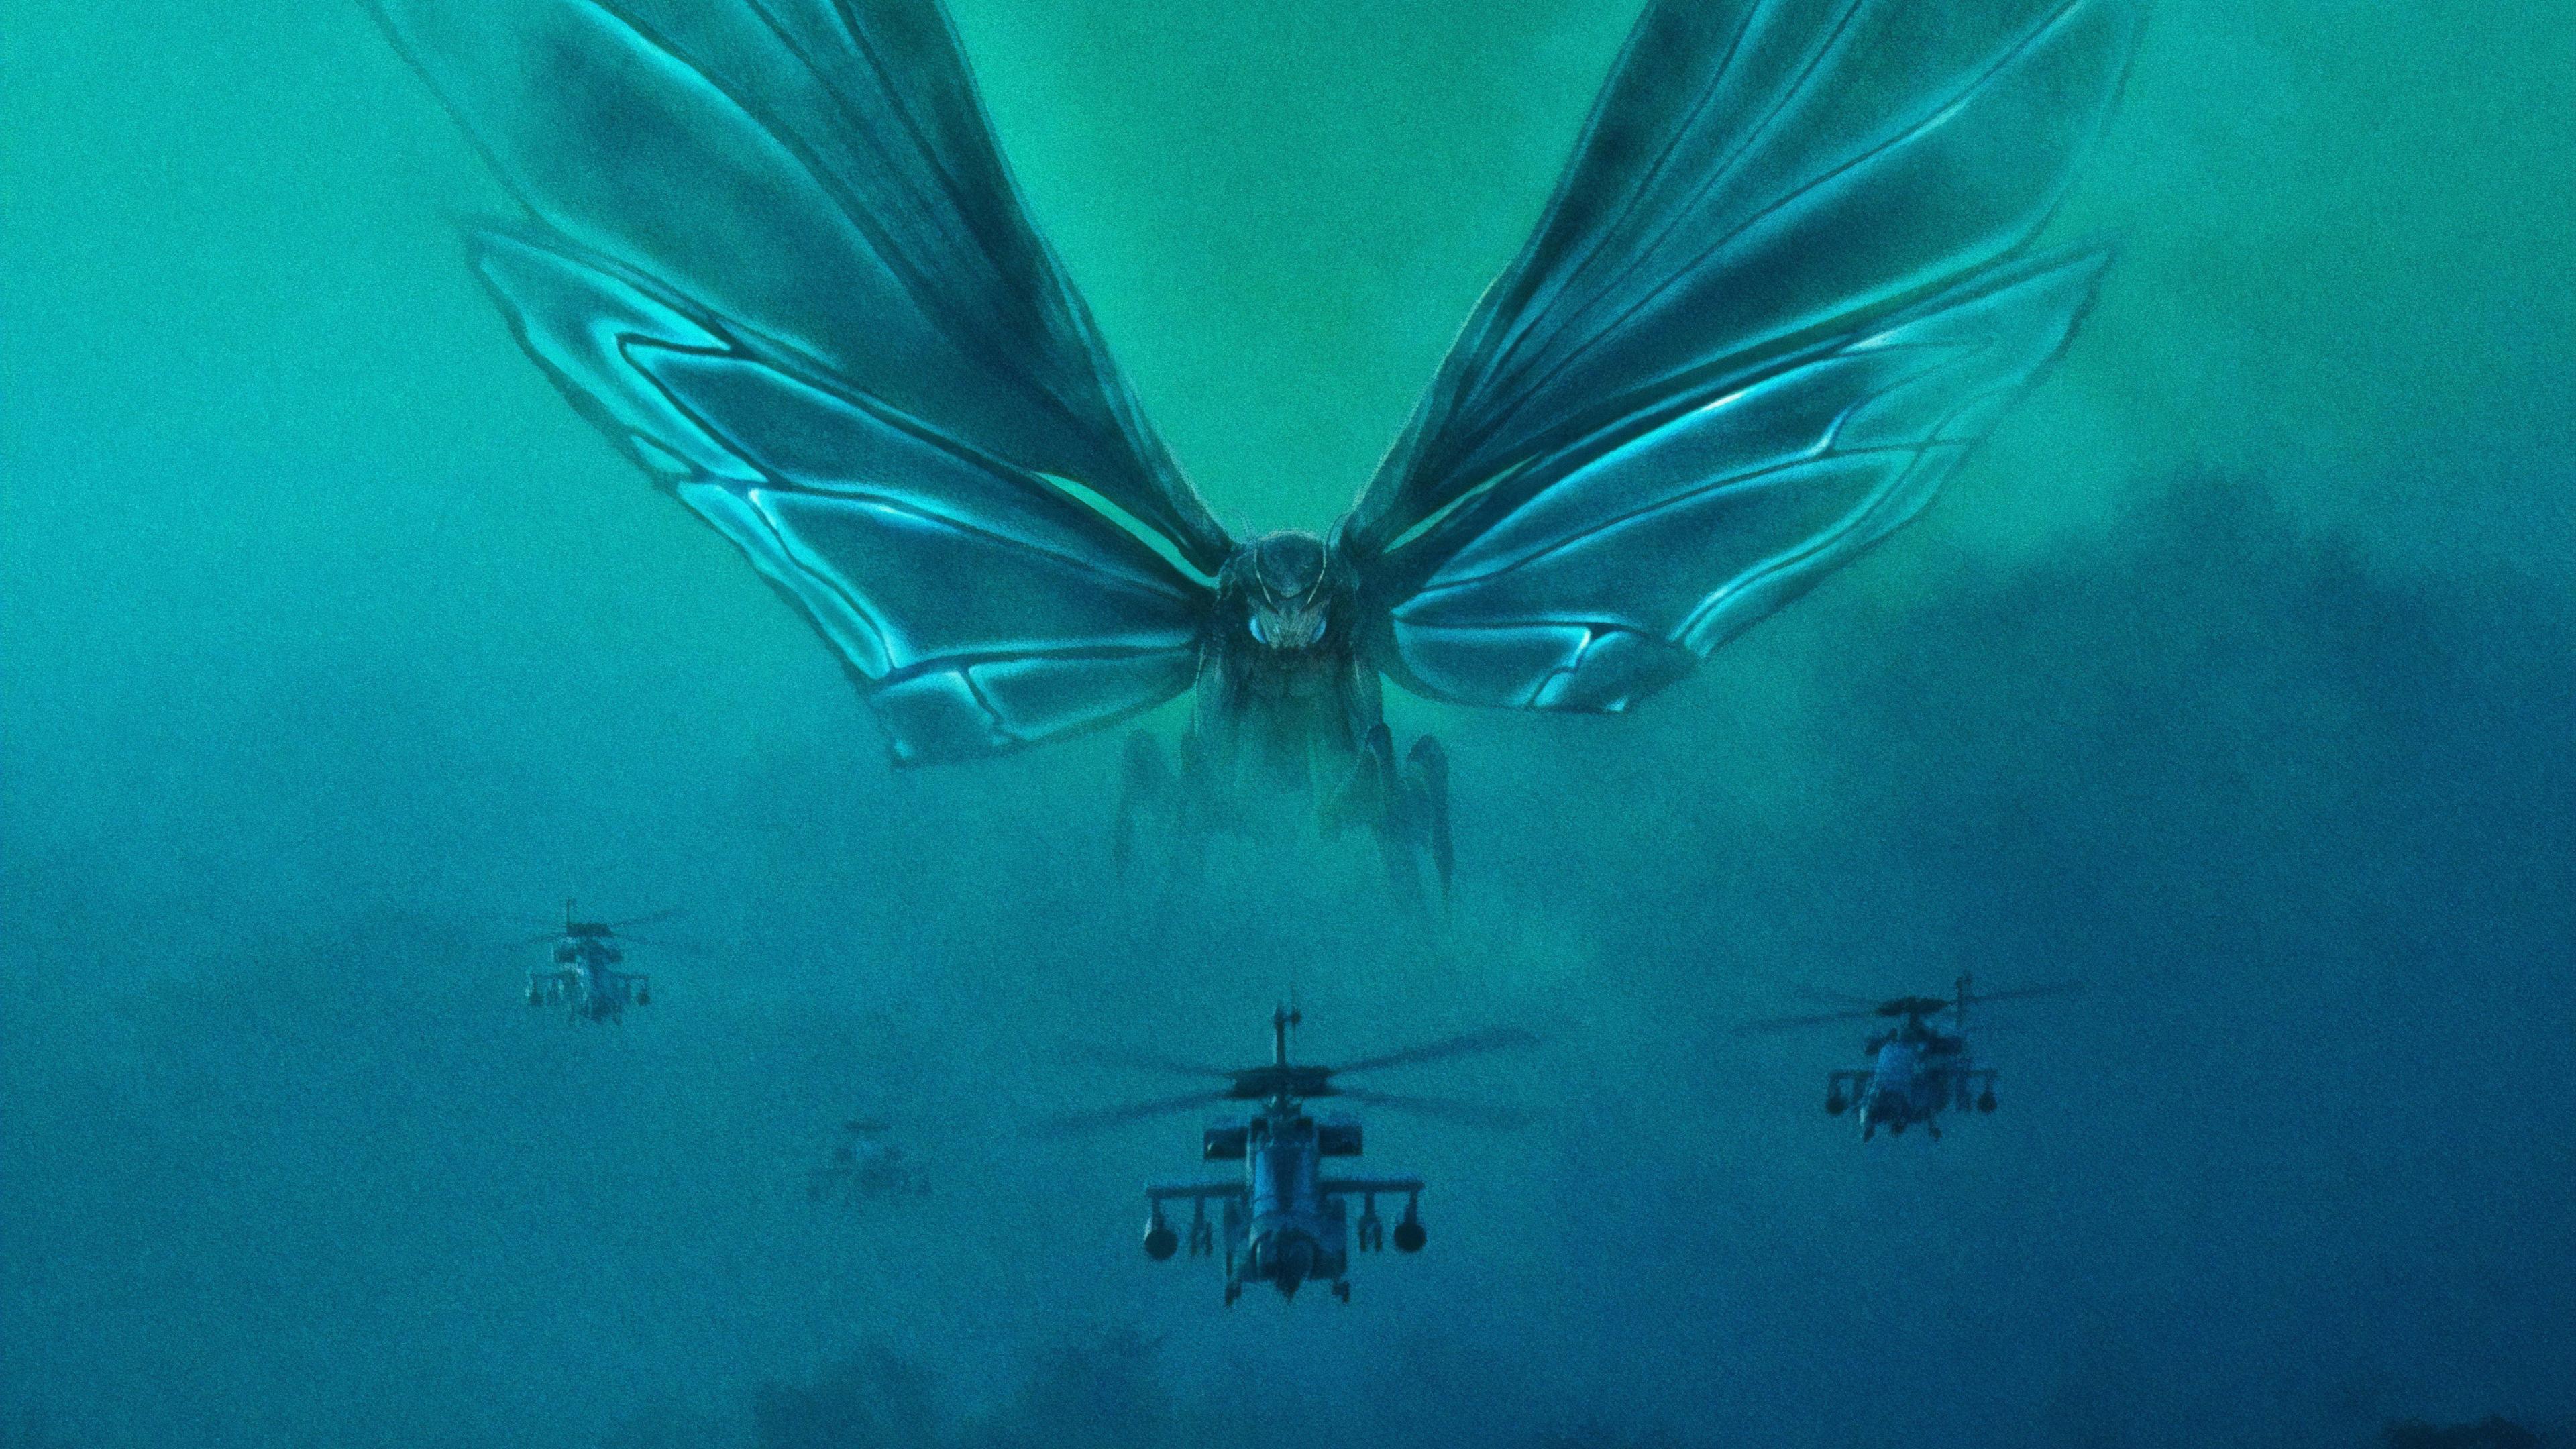 Godzilla King Of The Monsters 4k Ultra Hd Wallpaper Background